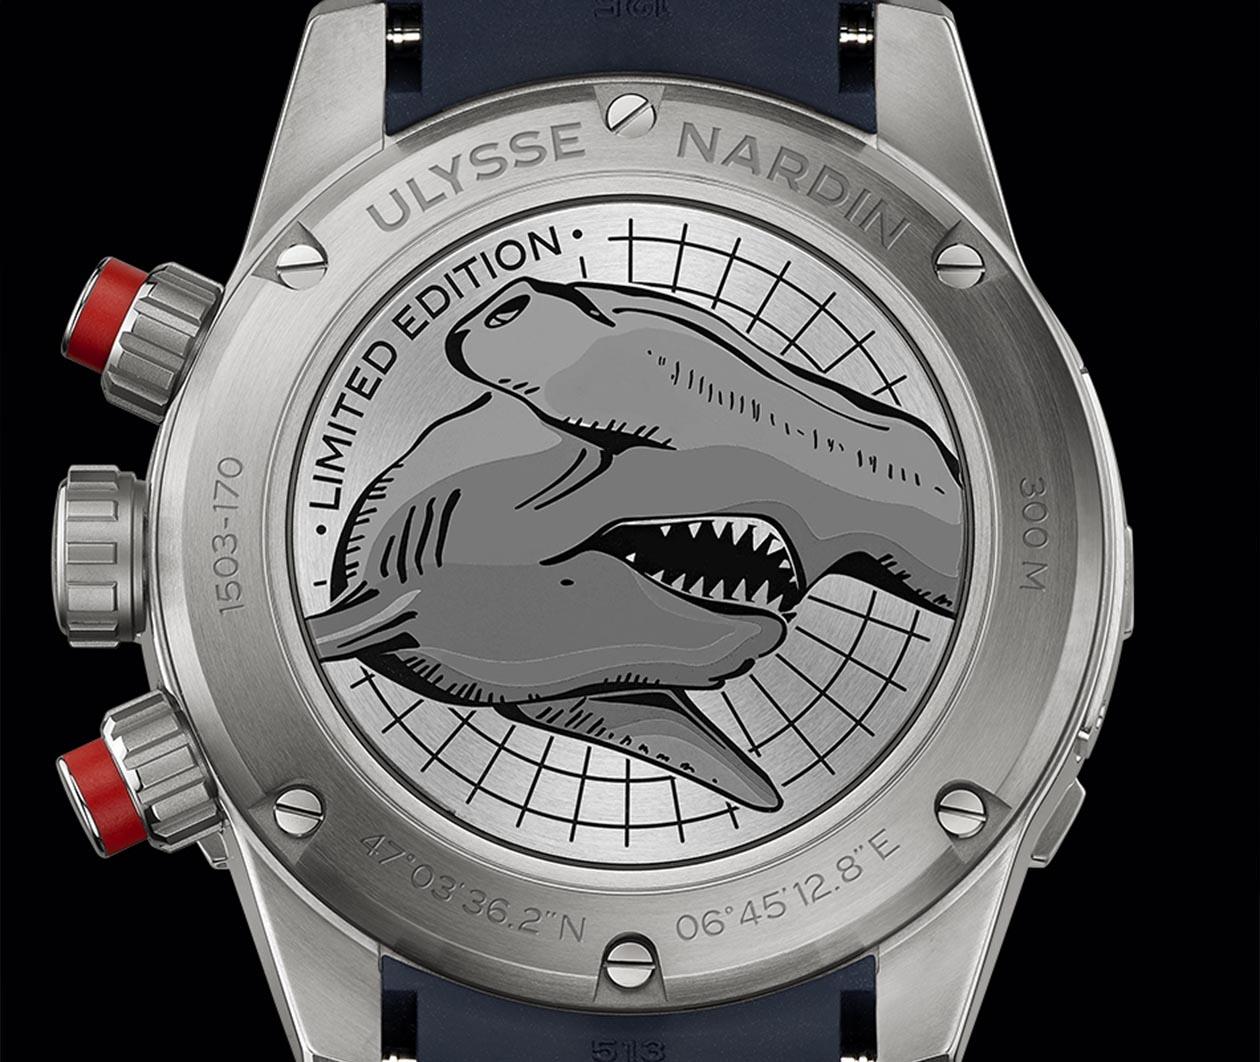 UlysseNardin Diver Chronograph 1503170LE393HAMMER Carousel 5 FINAL